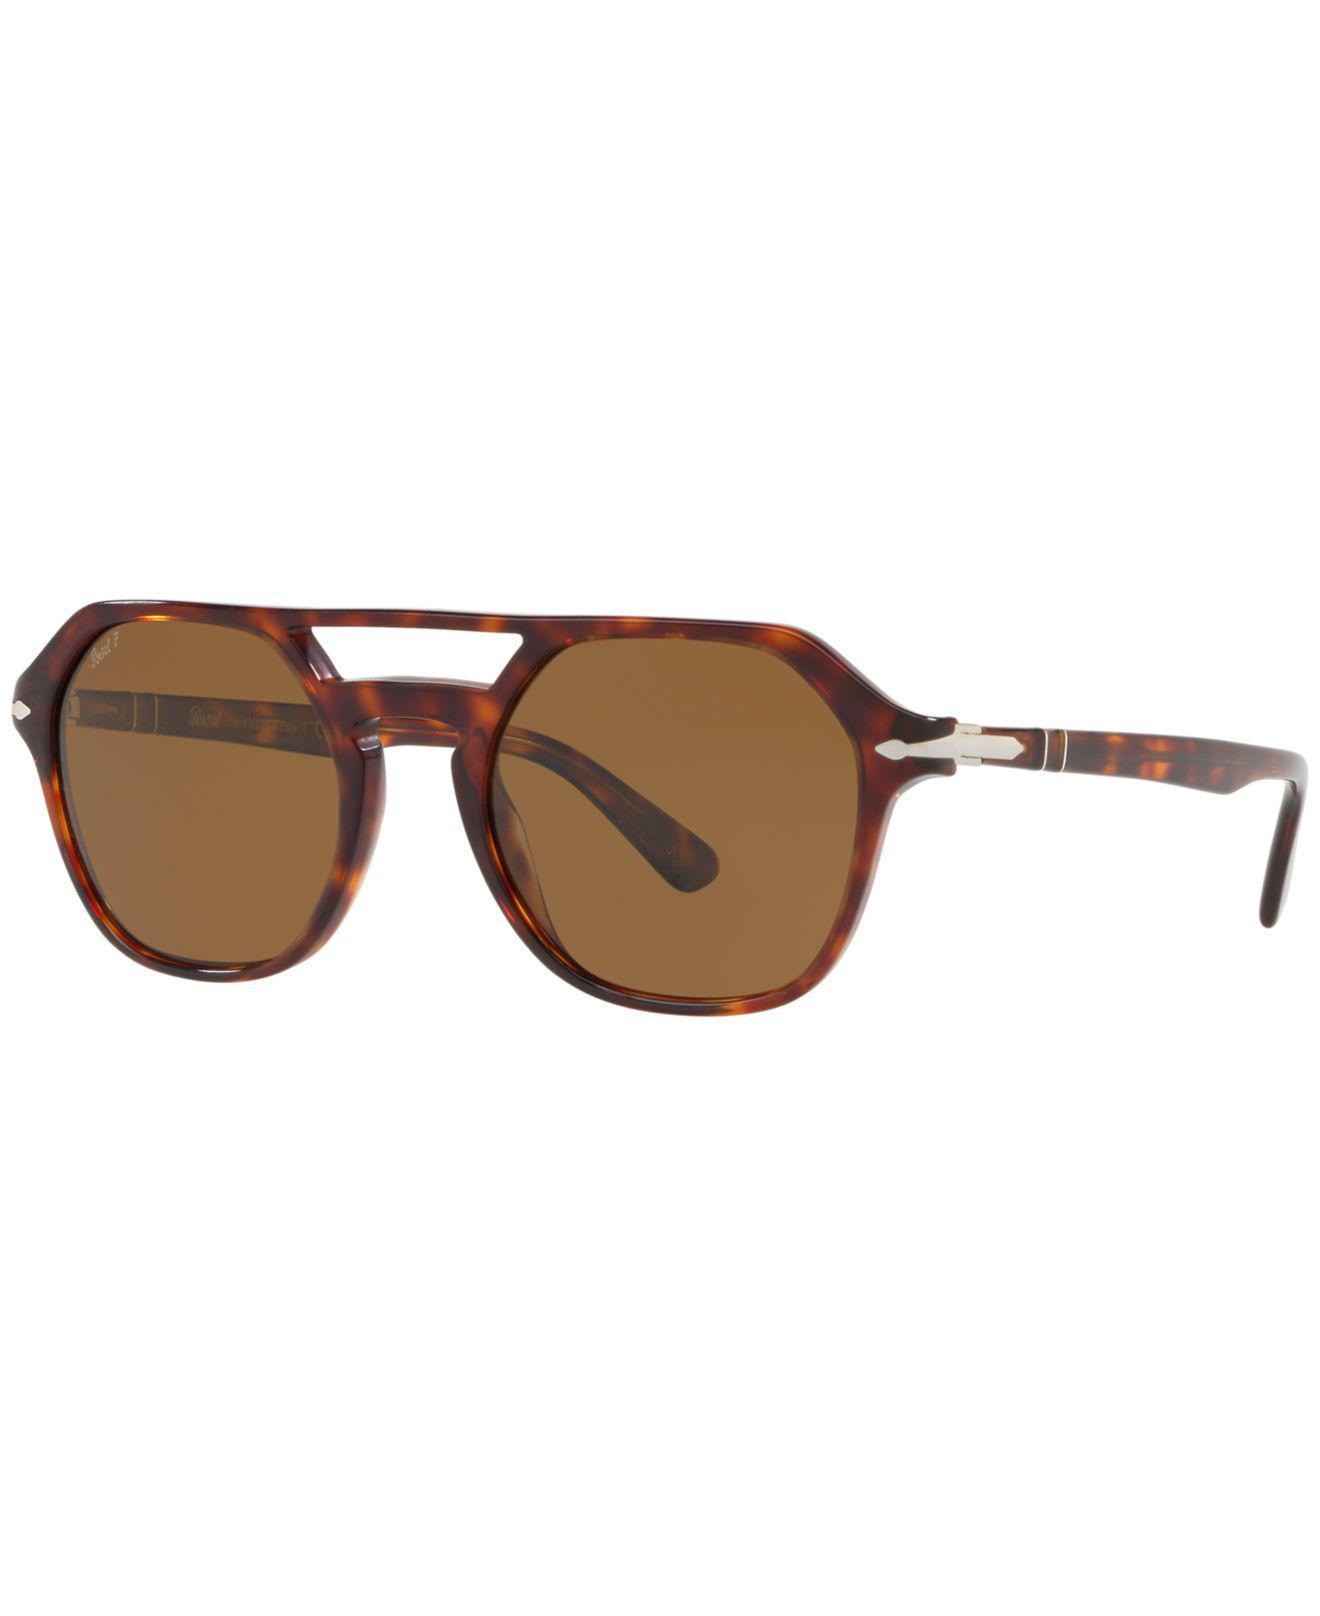 5ff4f681b8405 Lyst - Persol Polarized Sunglasses